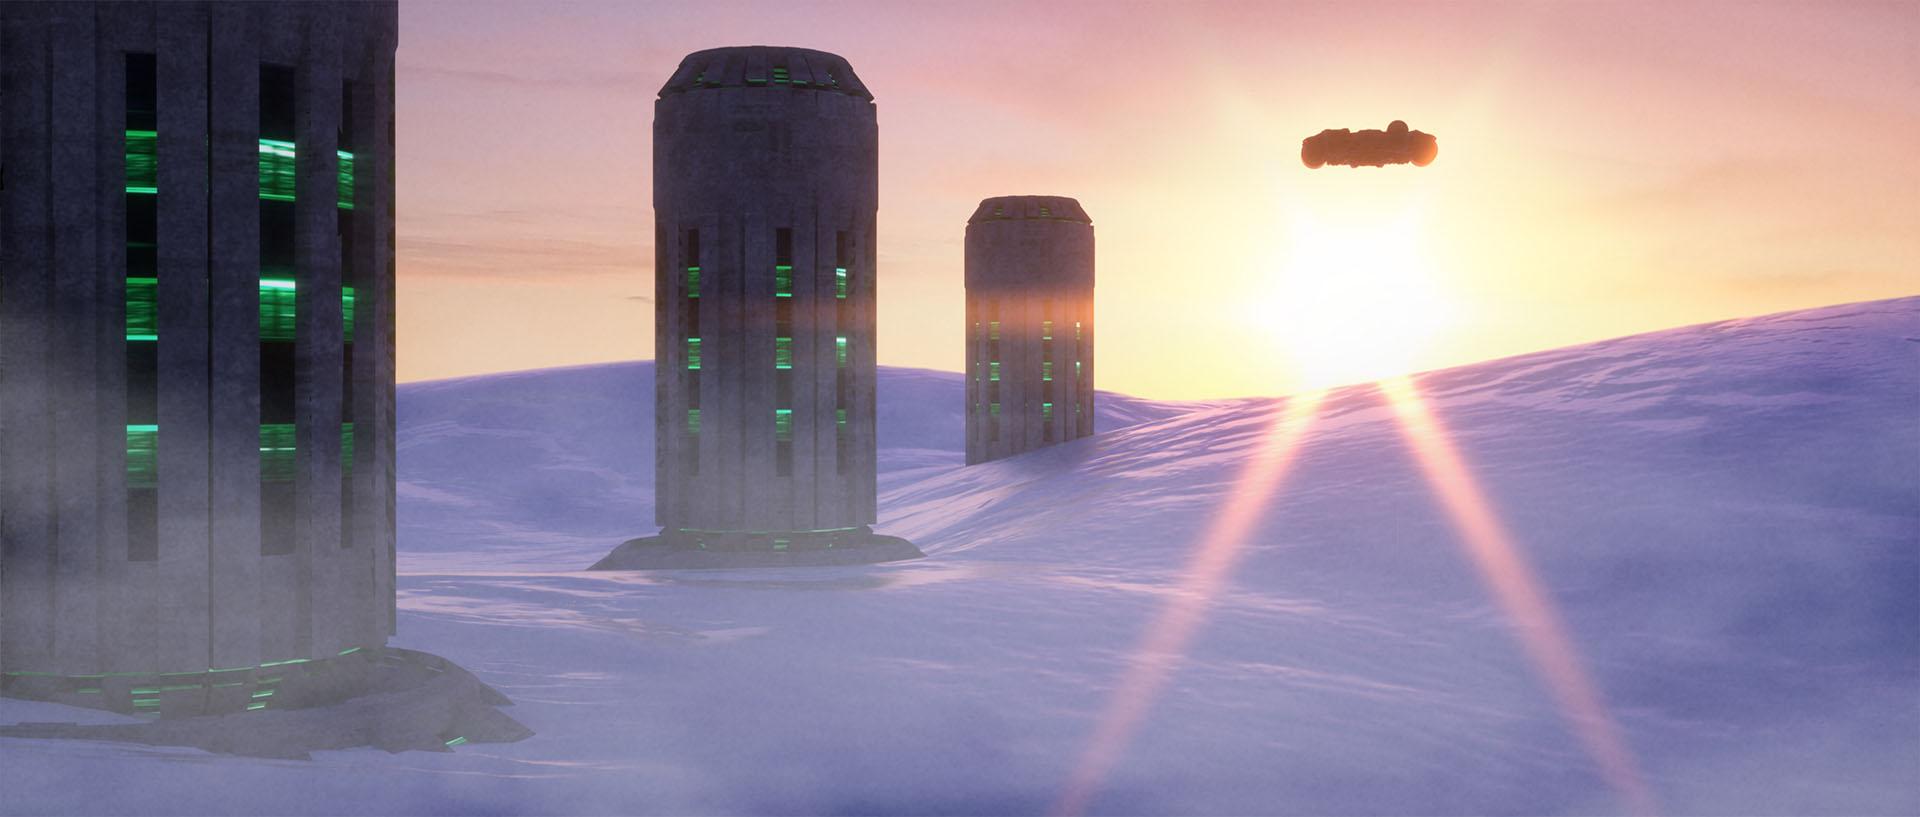 180903 Polar Generators1.jpg